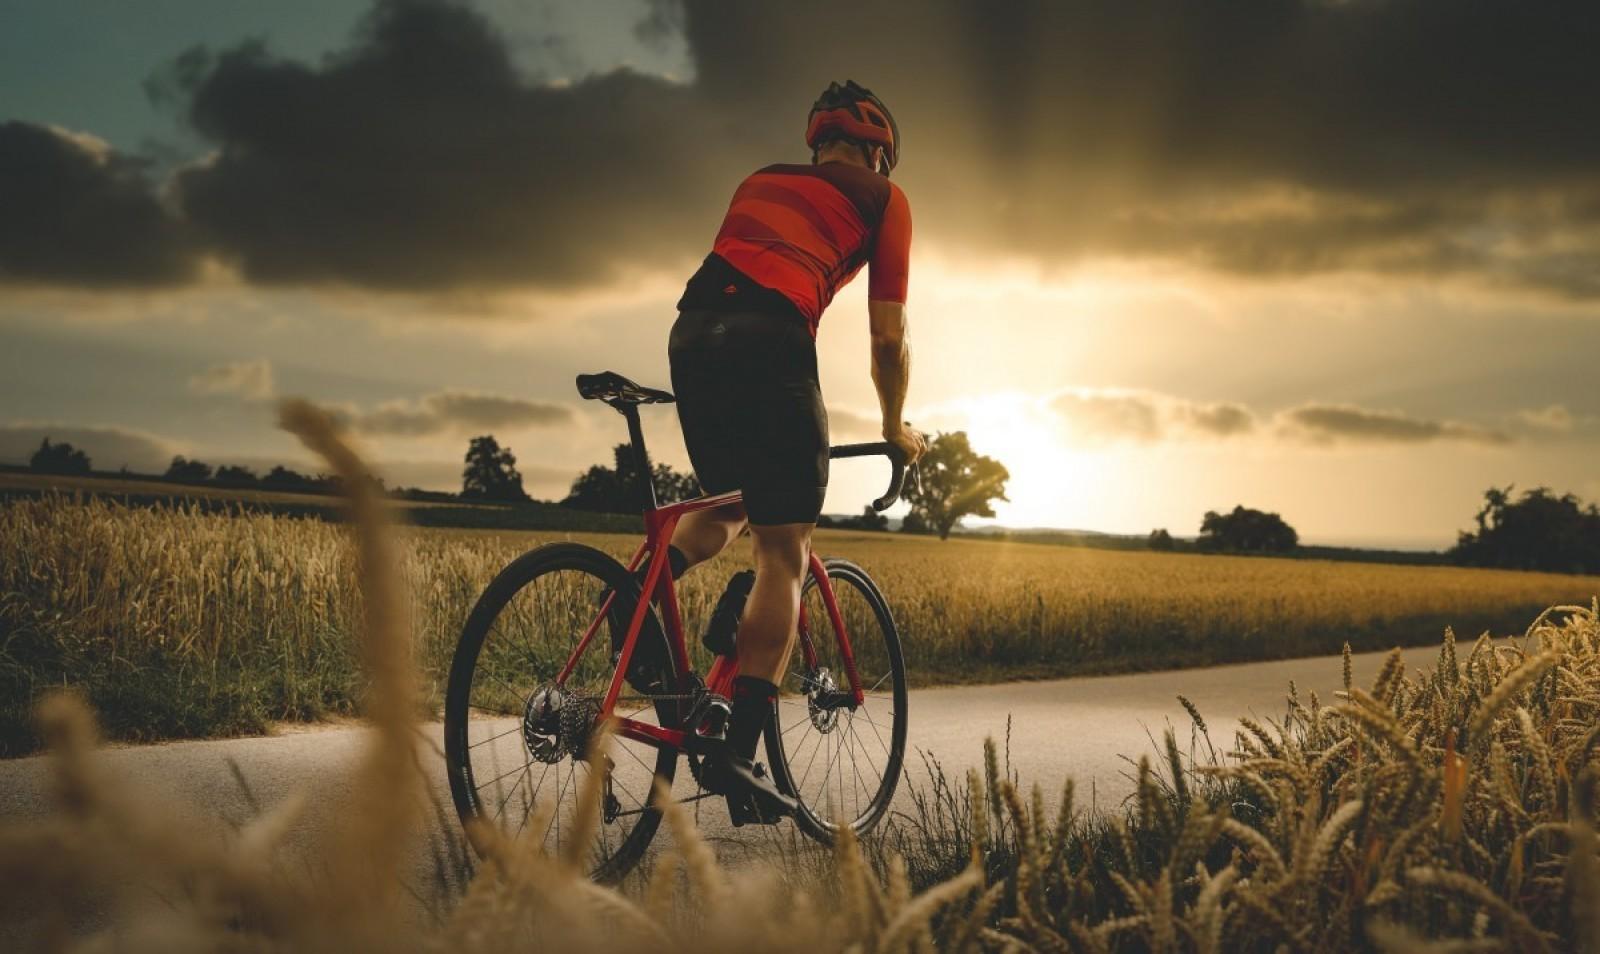 bici-aero-bici-gran-fondo-bici-escaladora/